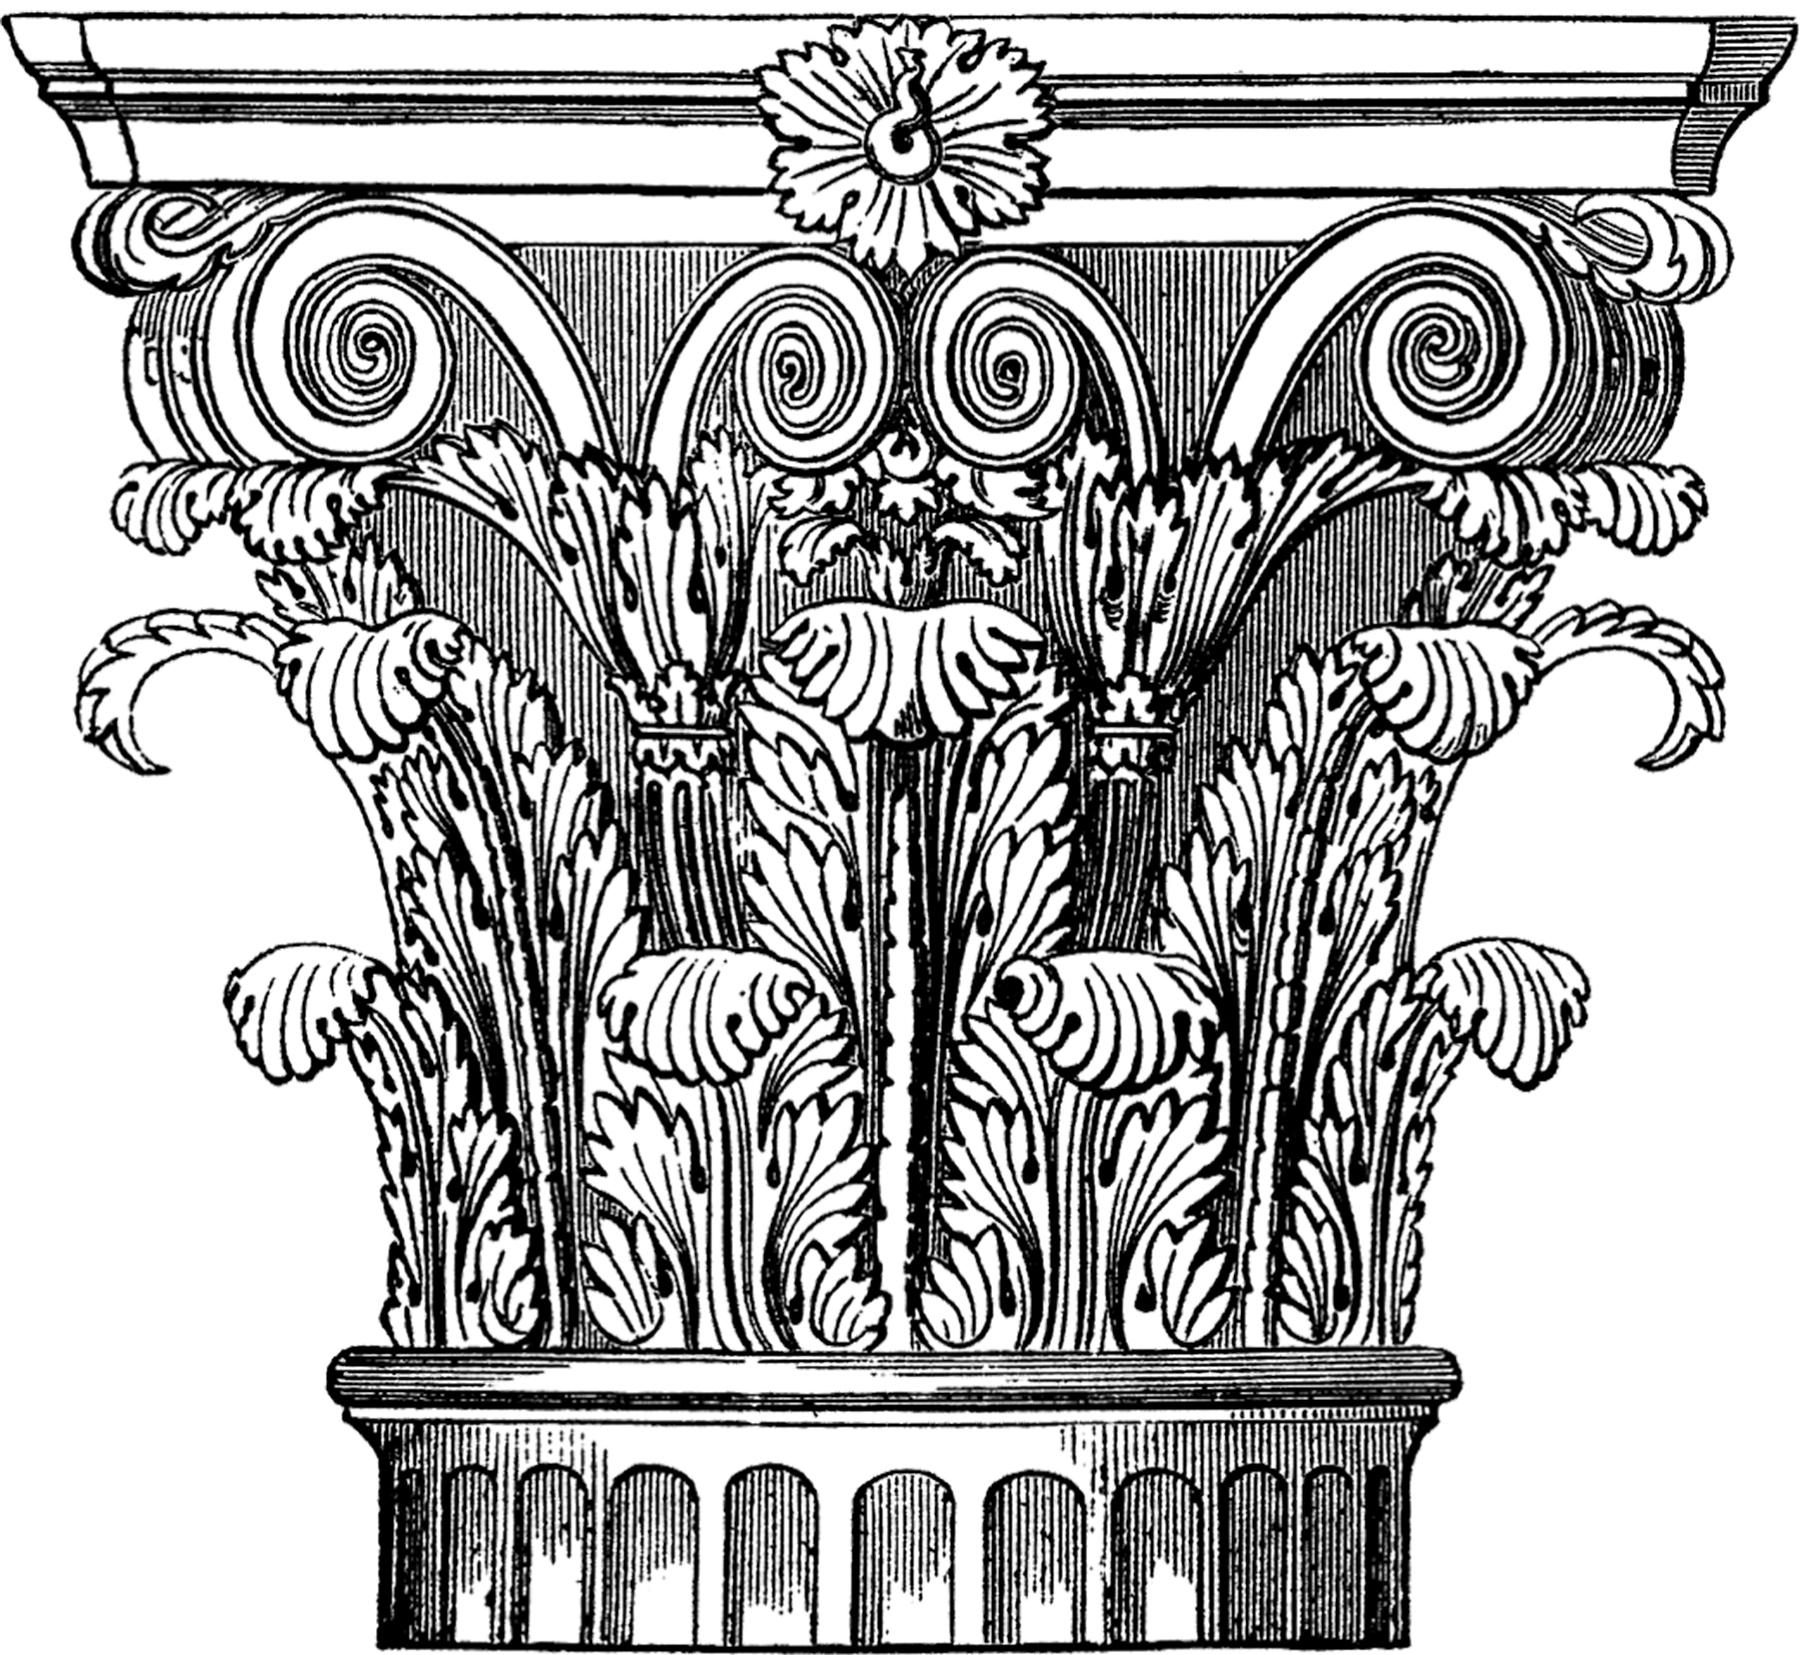 1800x1655 Ornate Corinthian Column Image!